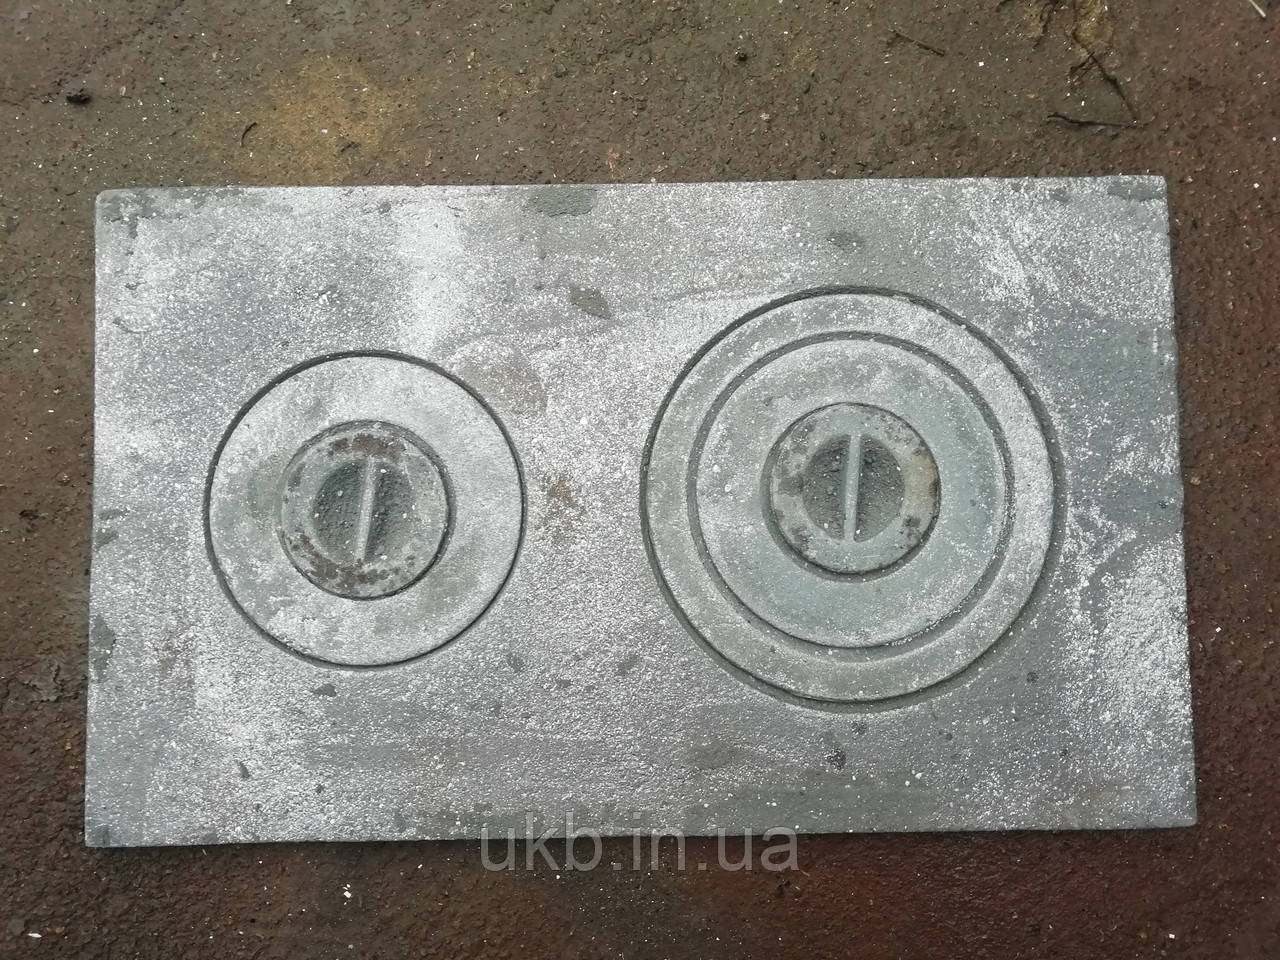 "Плита чавунна двухкомфорочная 590*350 мм ЗБ"" / Плита чавунна двокамфорна 590*350 мм ""ЗБ"""